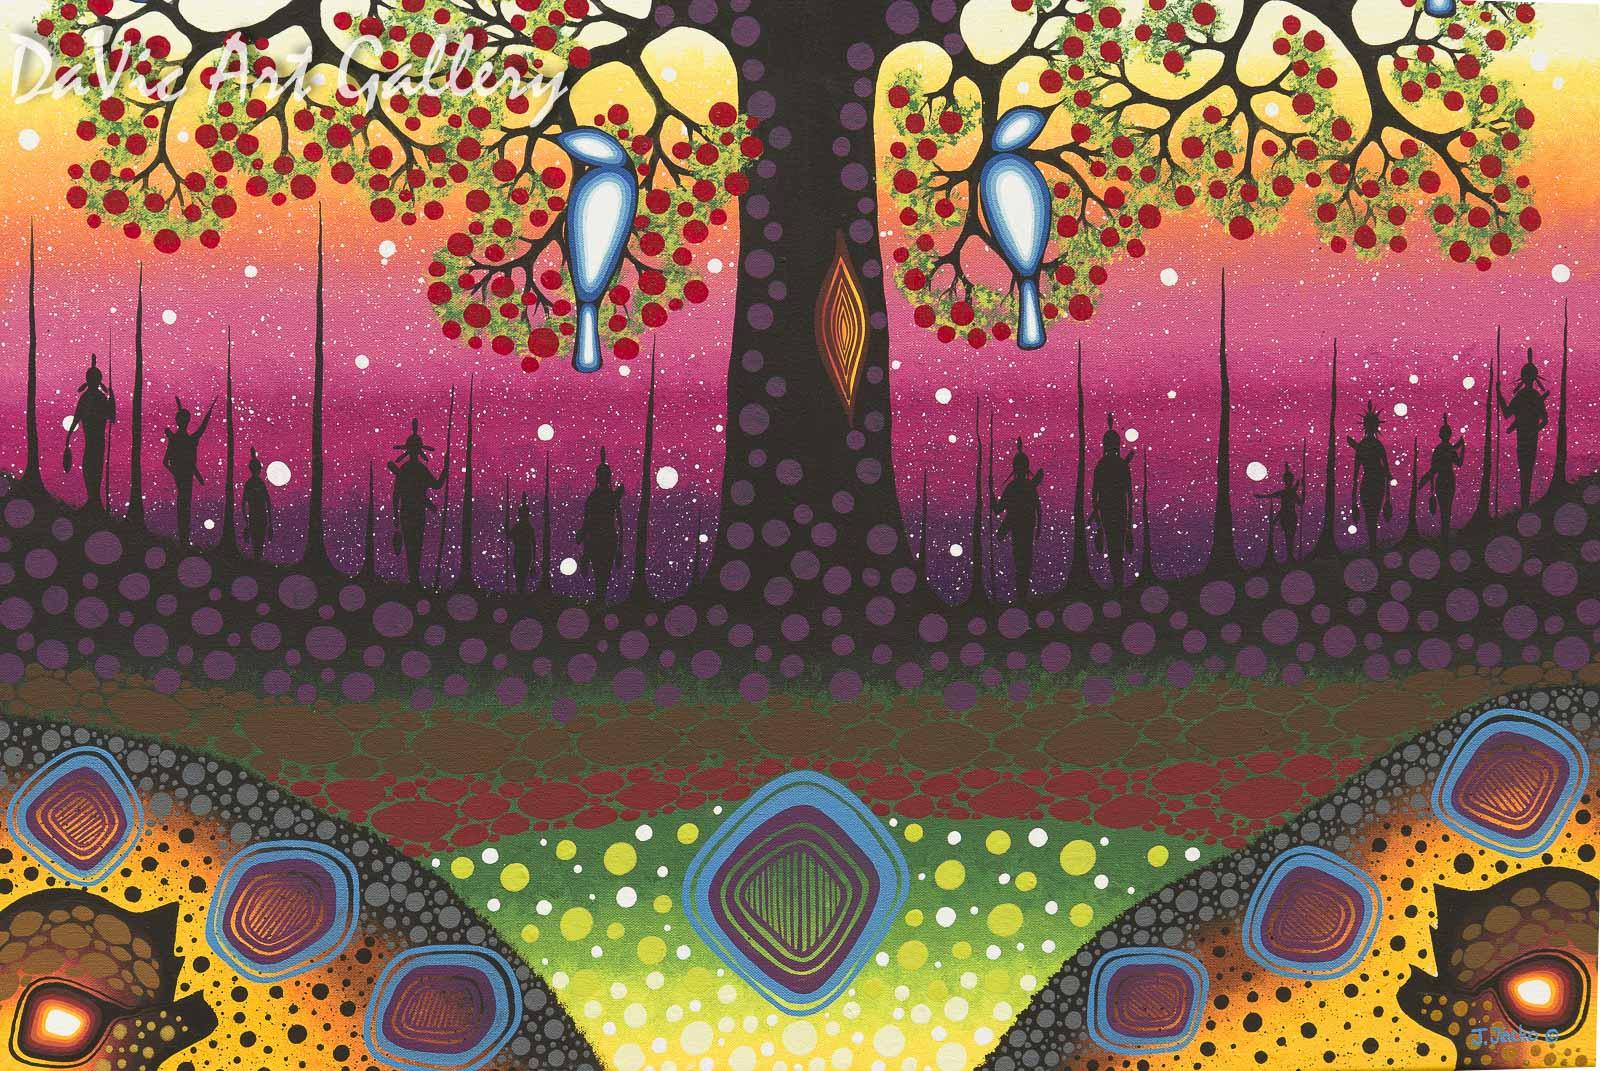 Quot Tree Of Life Quot By James Jacko Anishinaabe Native